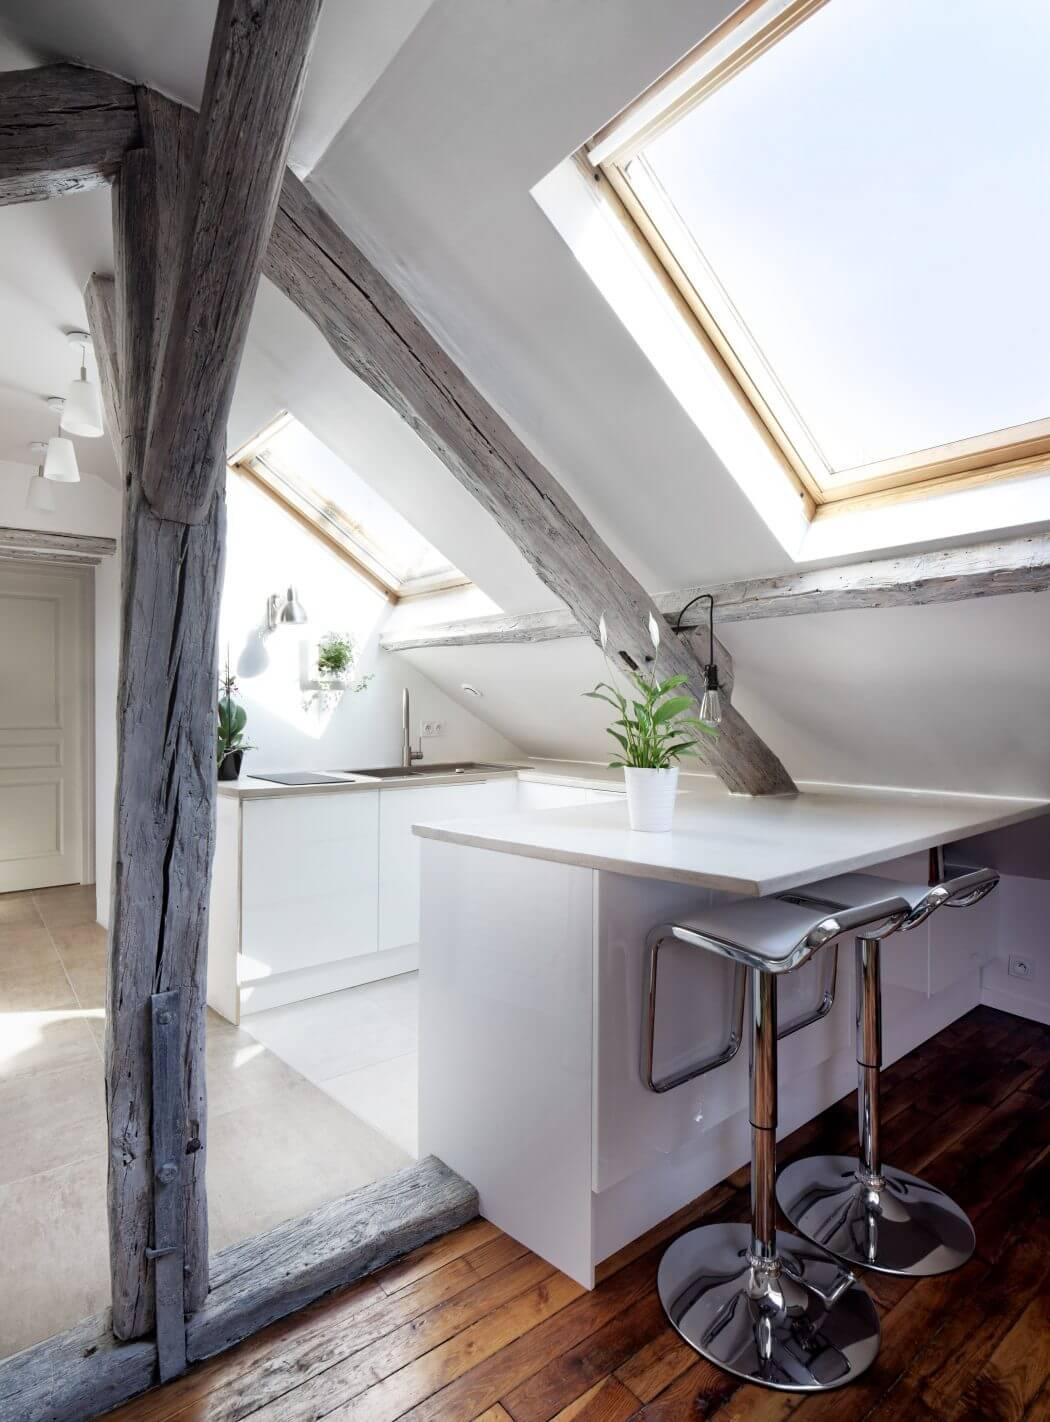 cozy attic apartment woodz wood beam roof window kitchen design ideas